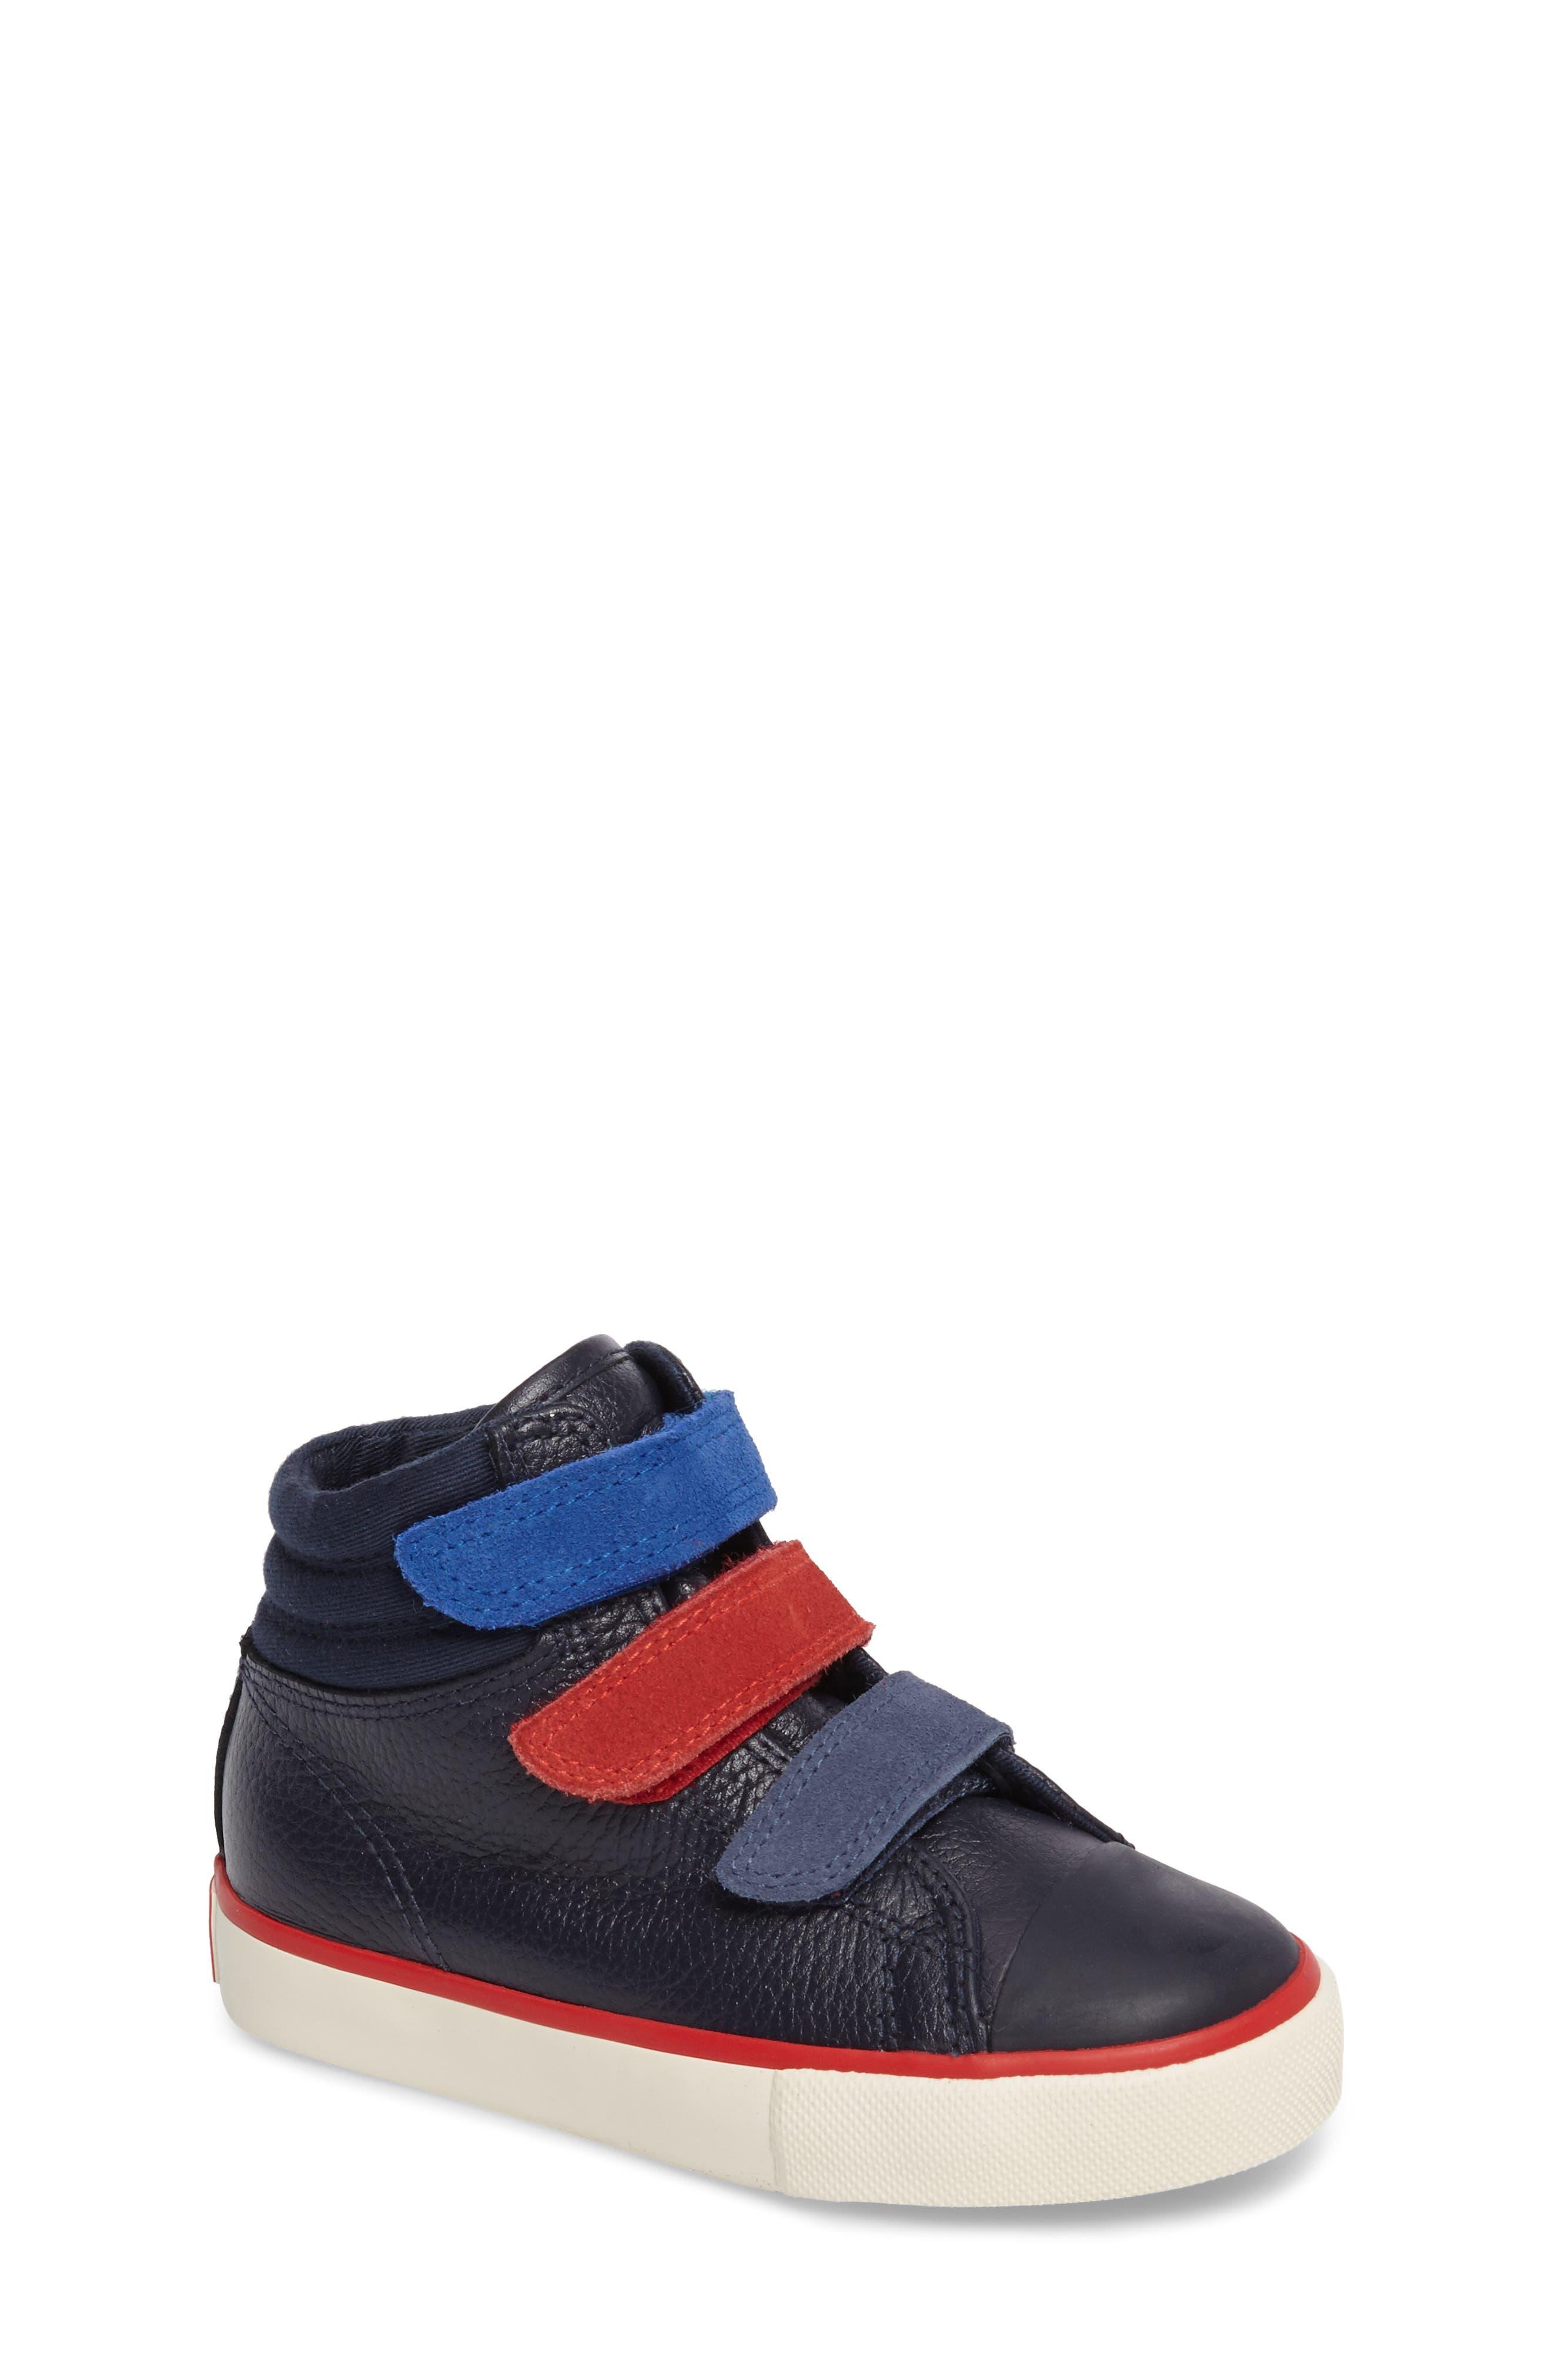 High Top Sneaker,                         Main,                         color, Navy